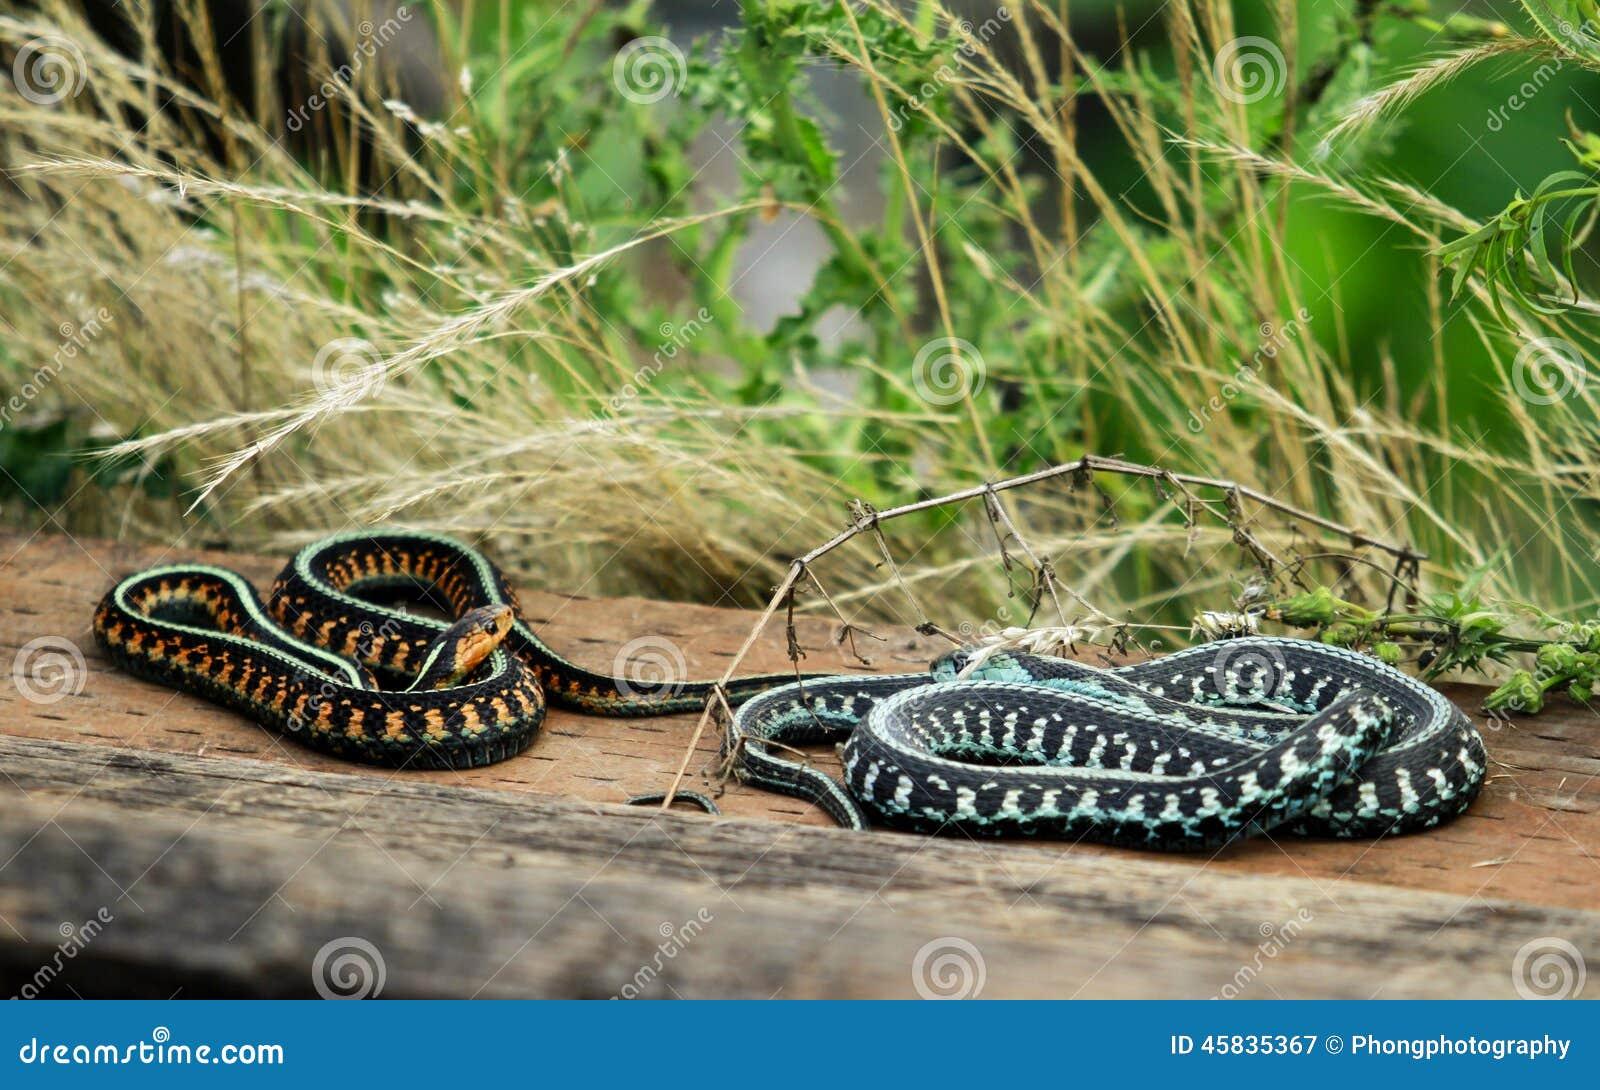 Duas serpentes coloridas